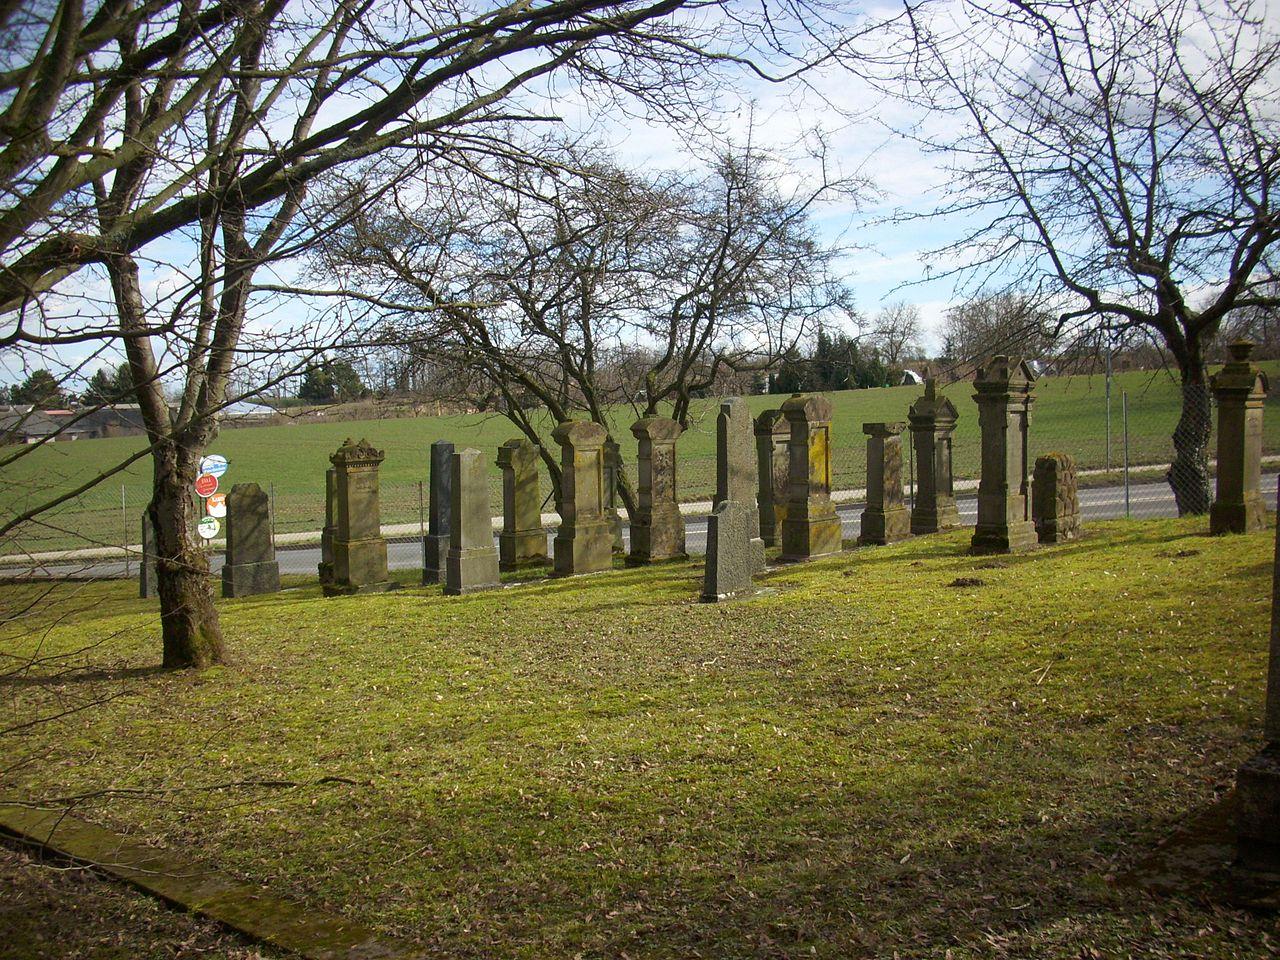 Denkmalzone Jüdischer Friedhof Ebersheim 5.JPG